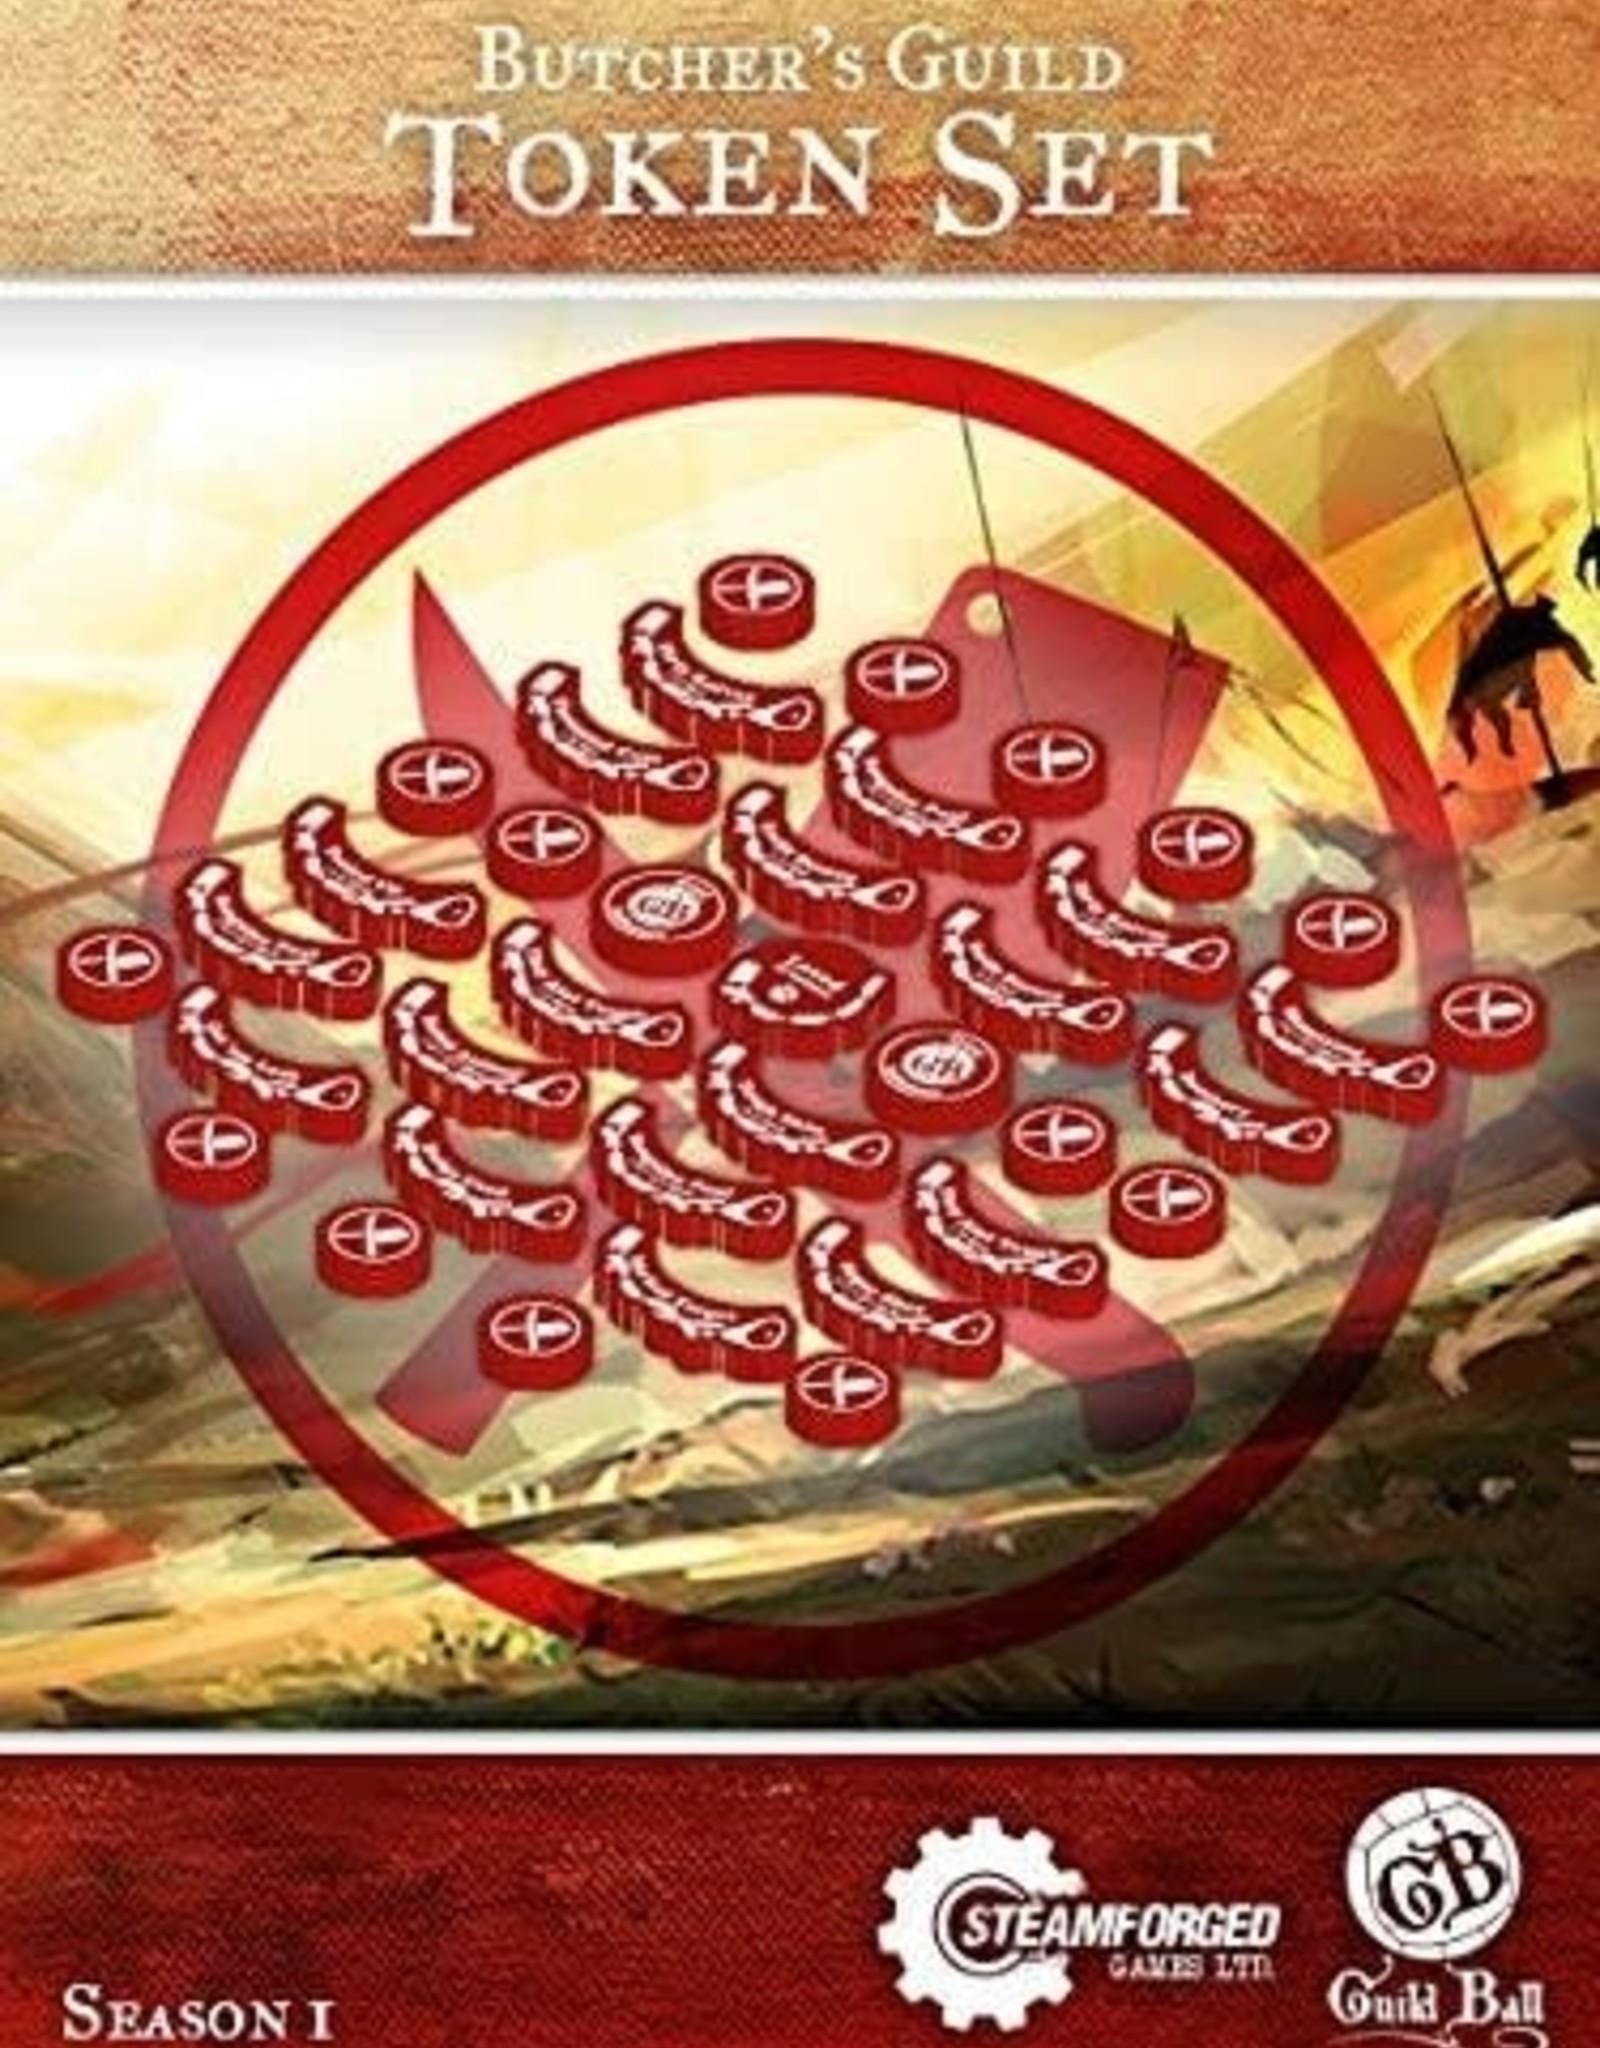 Guild Ball GB - Butcher's Guild Token Set